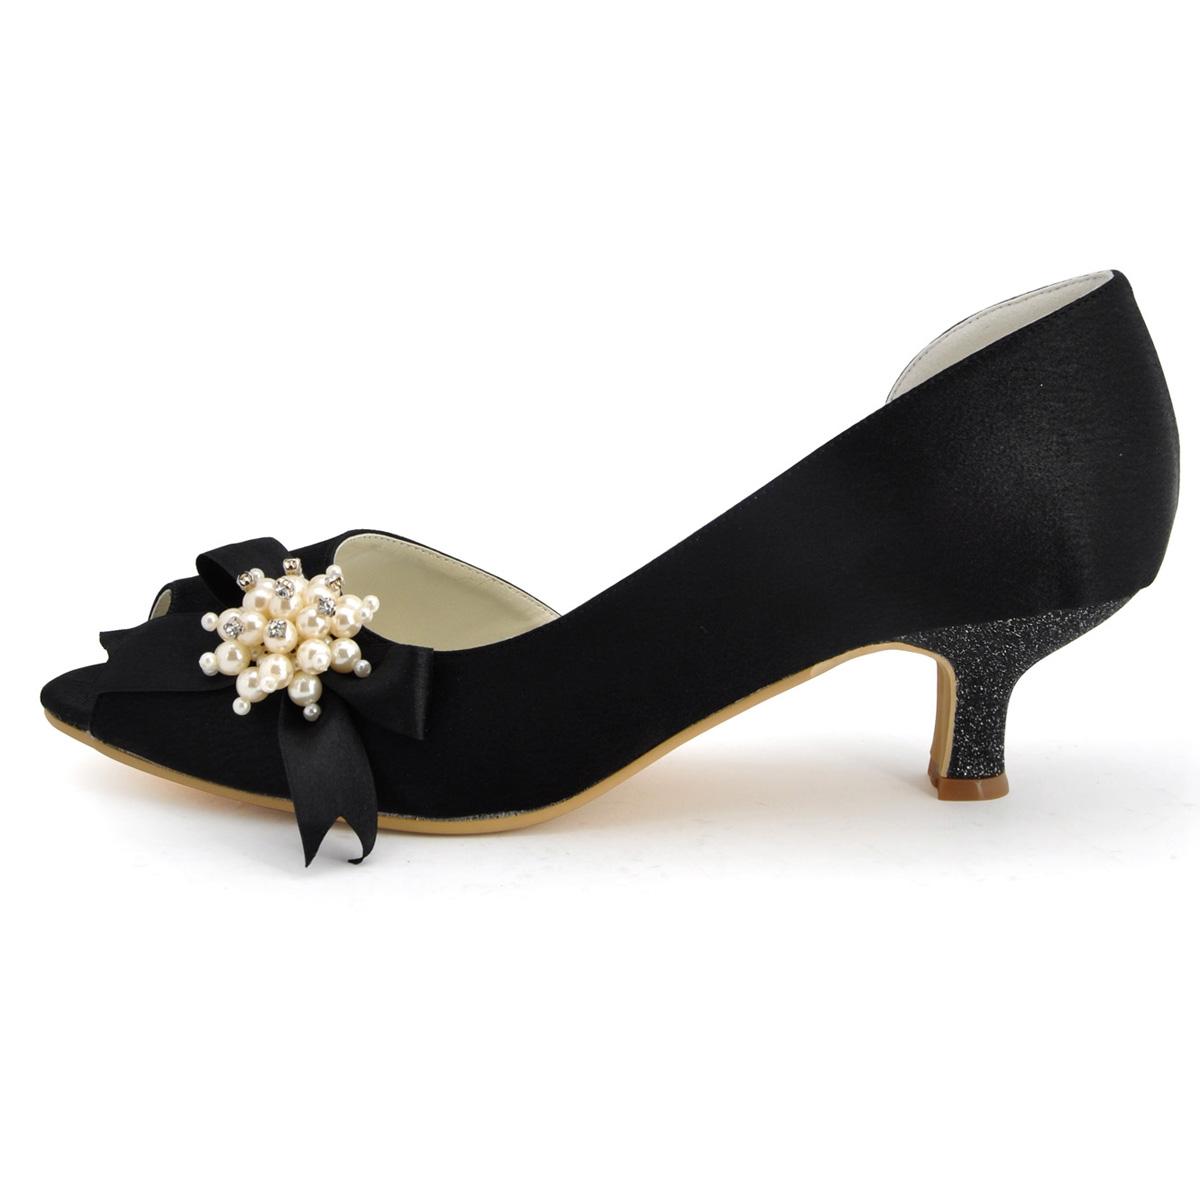 chaussures talon satin noir. Black Bedroom Furniture Sets. Home Design Ideas